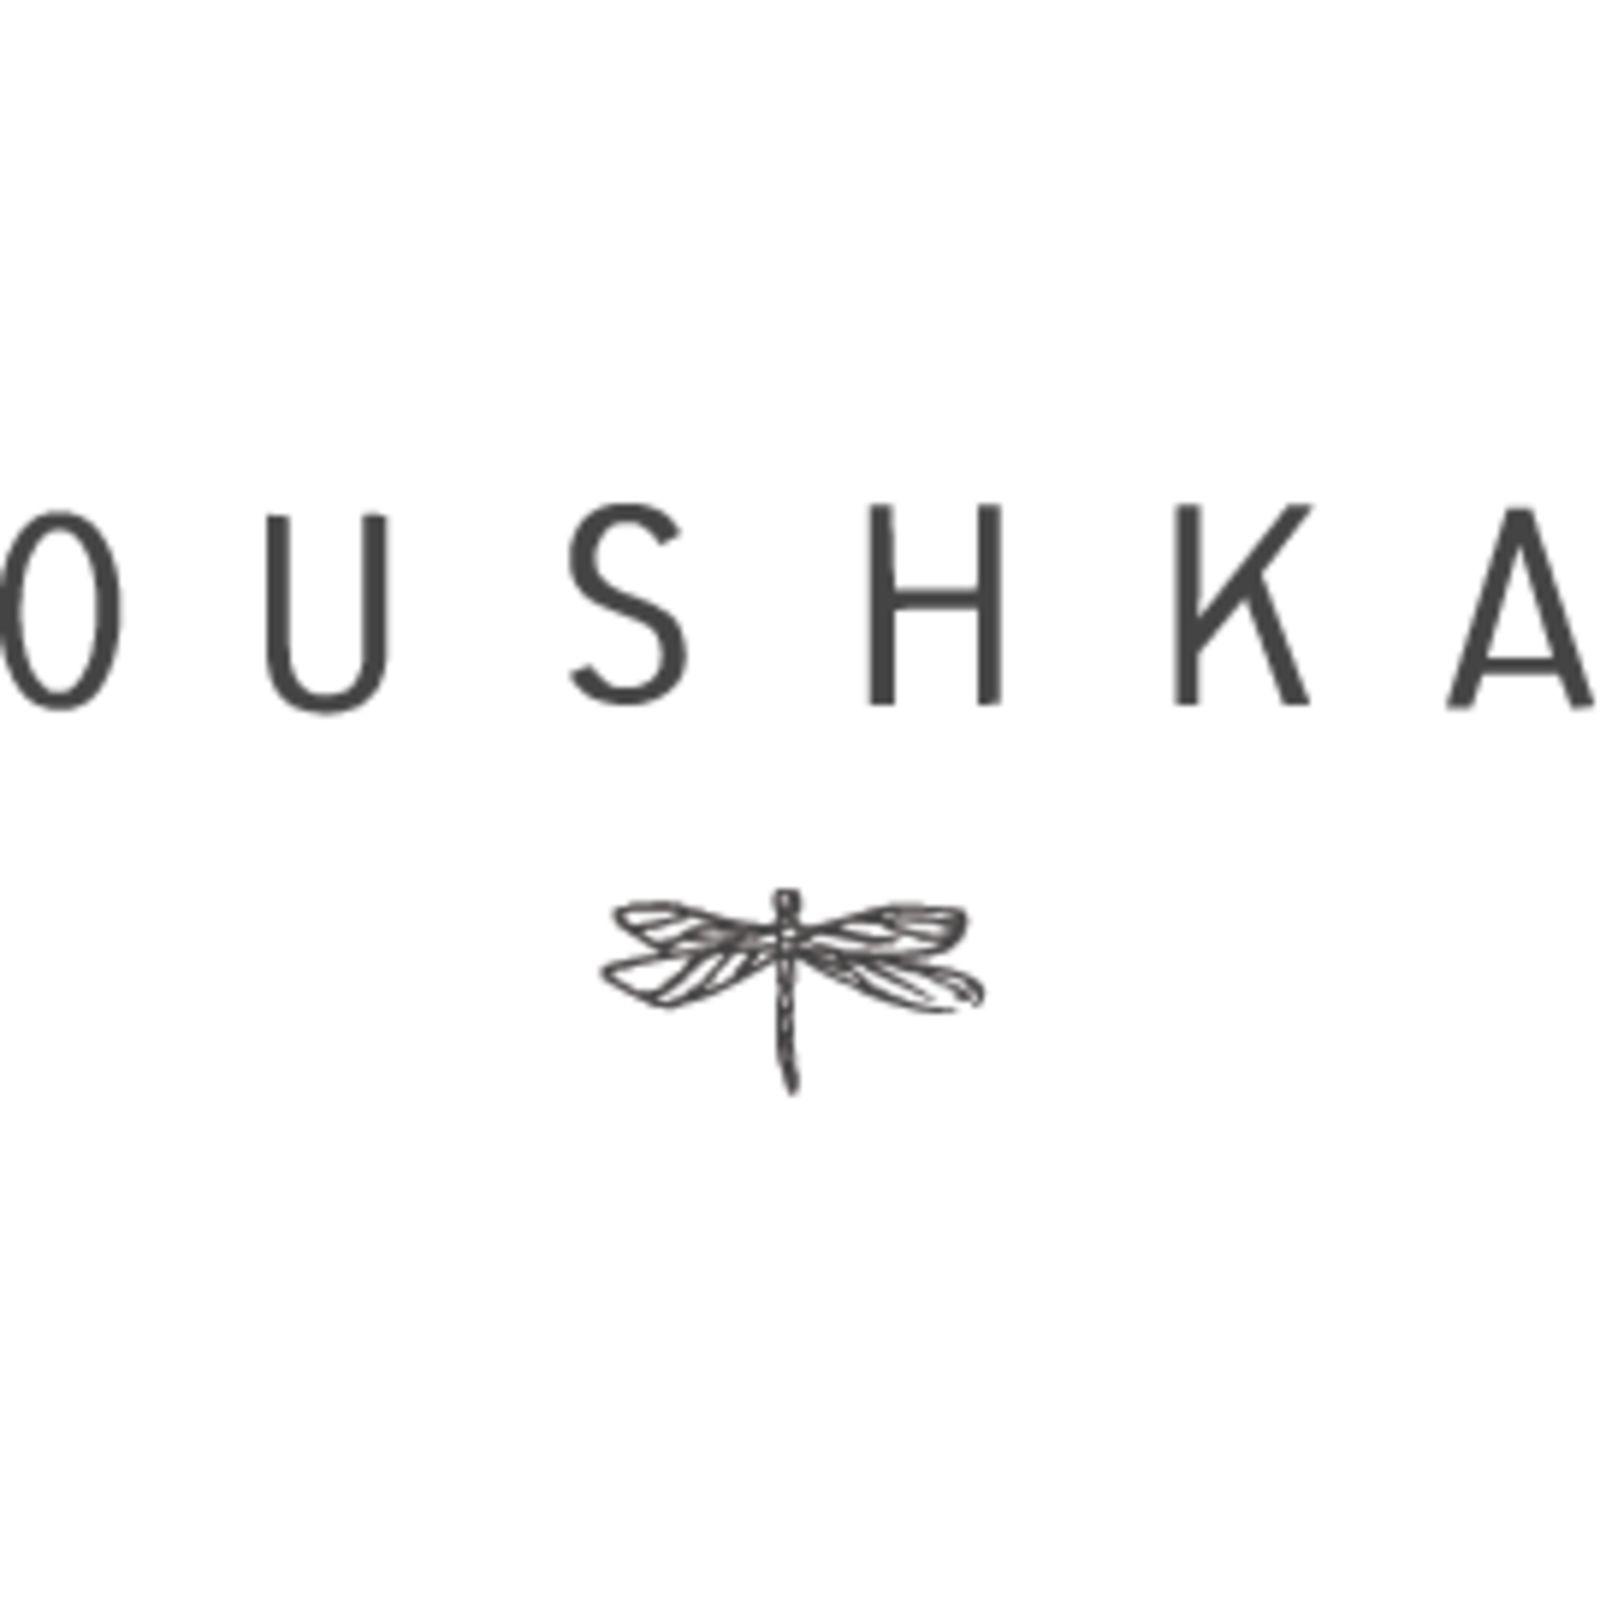 OUSHKA